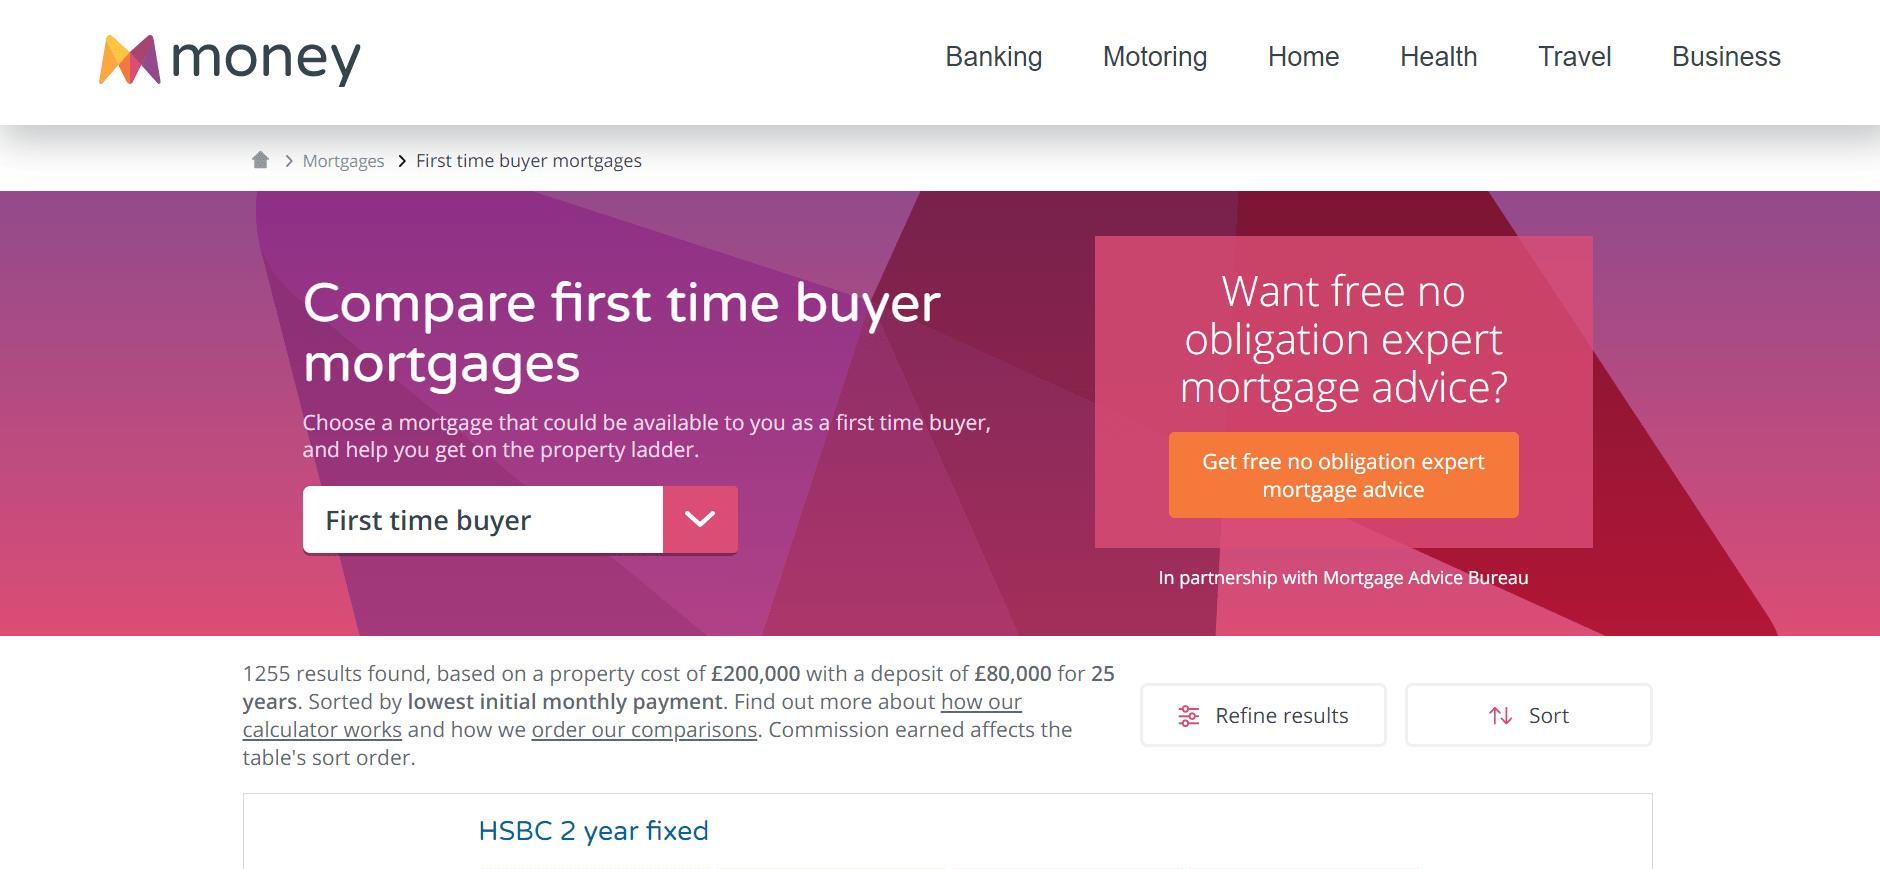 Money.co.uk landing page